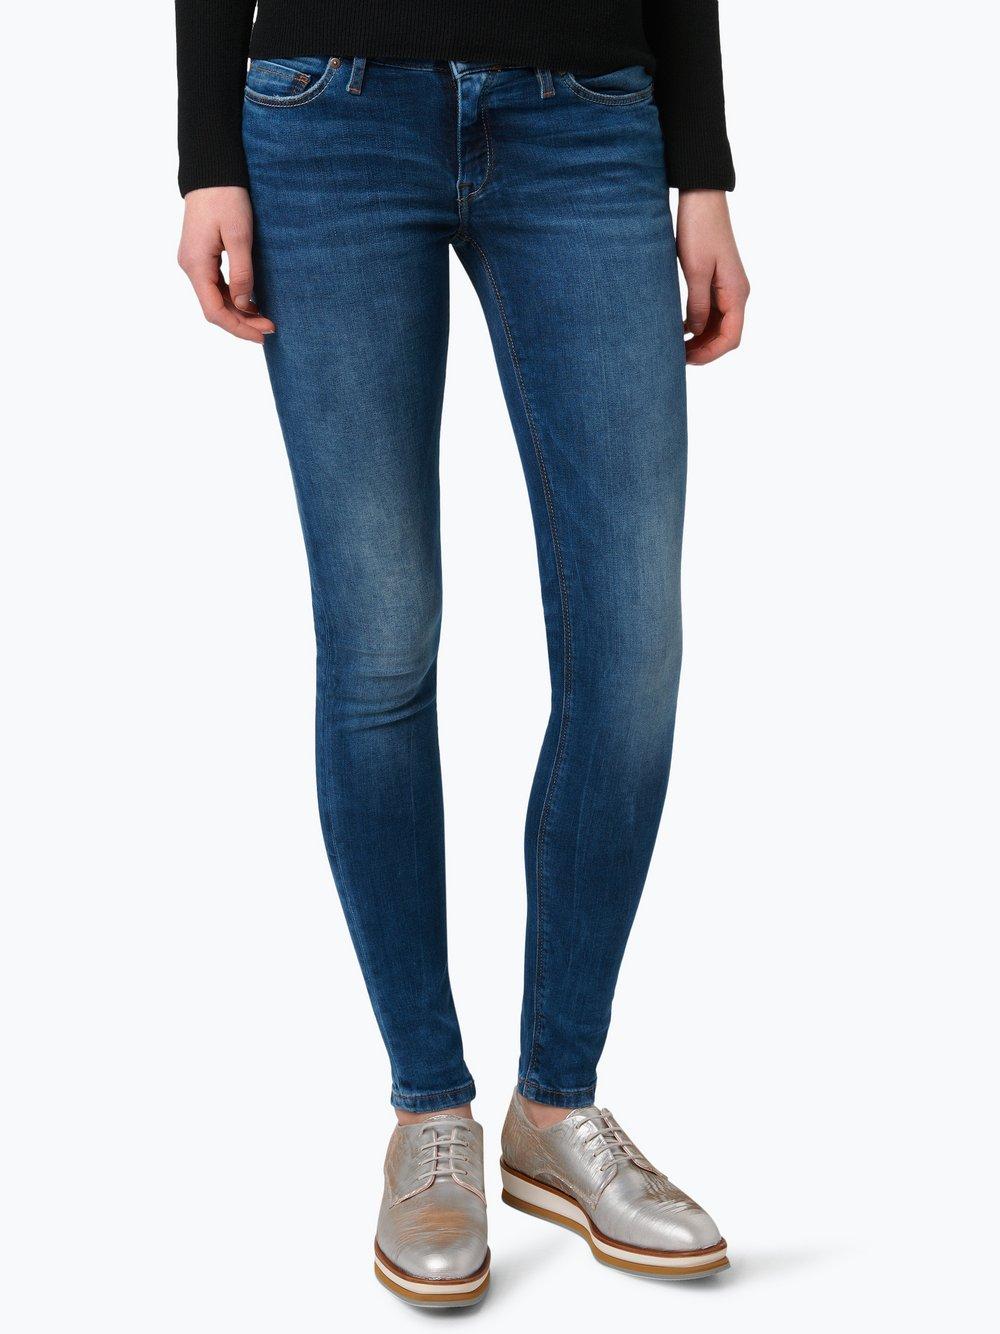 7f2f780f903c Marc O'Polo Denim Damen Jeans - Siv online kaufen | PEEK-UND ...